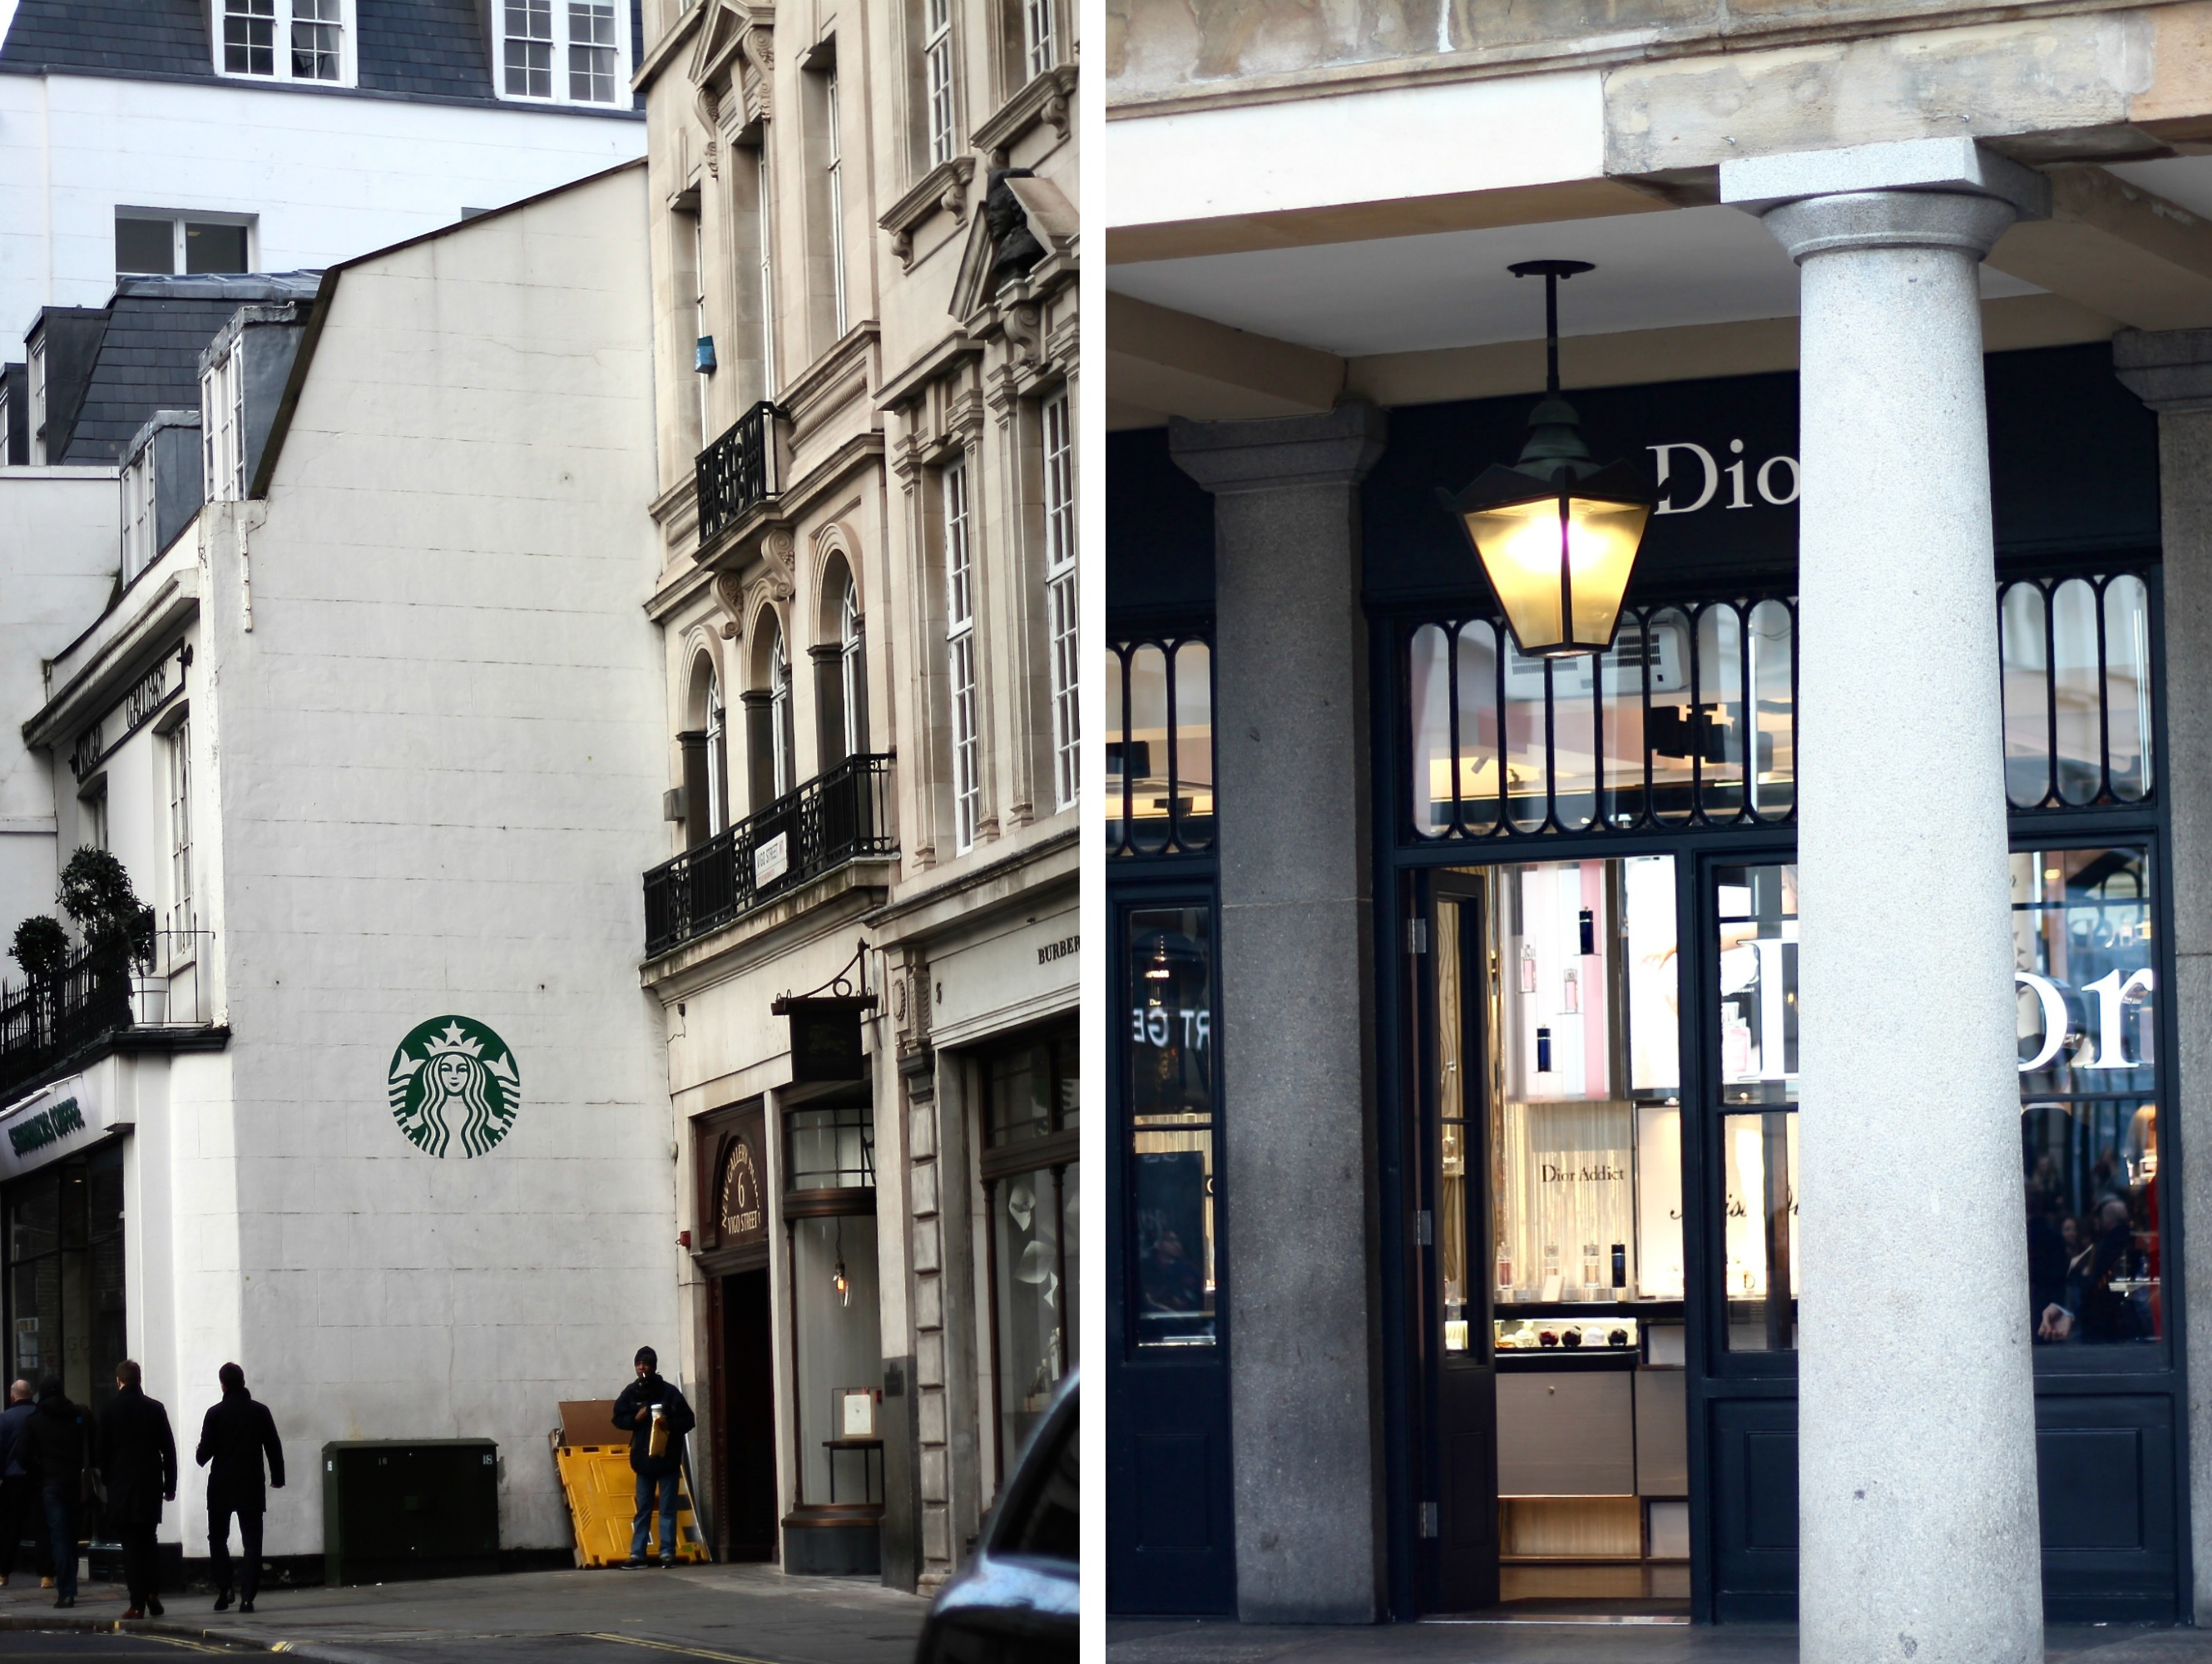 Oxfordstreet and Covent Garden London - katiys.com